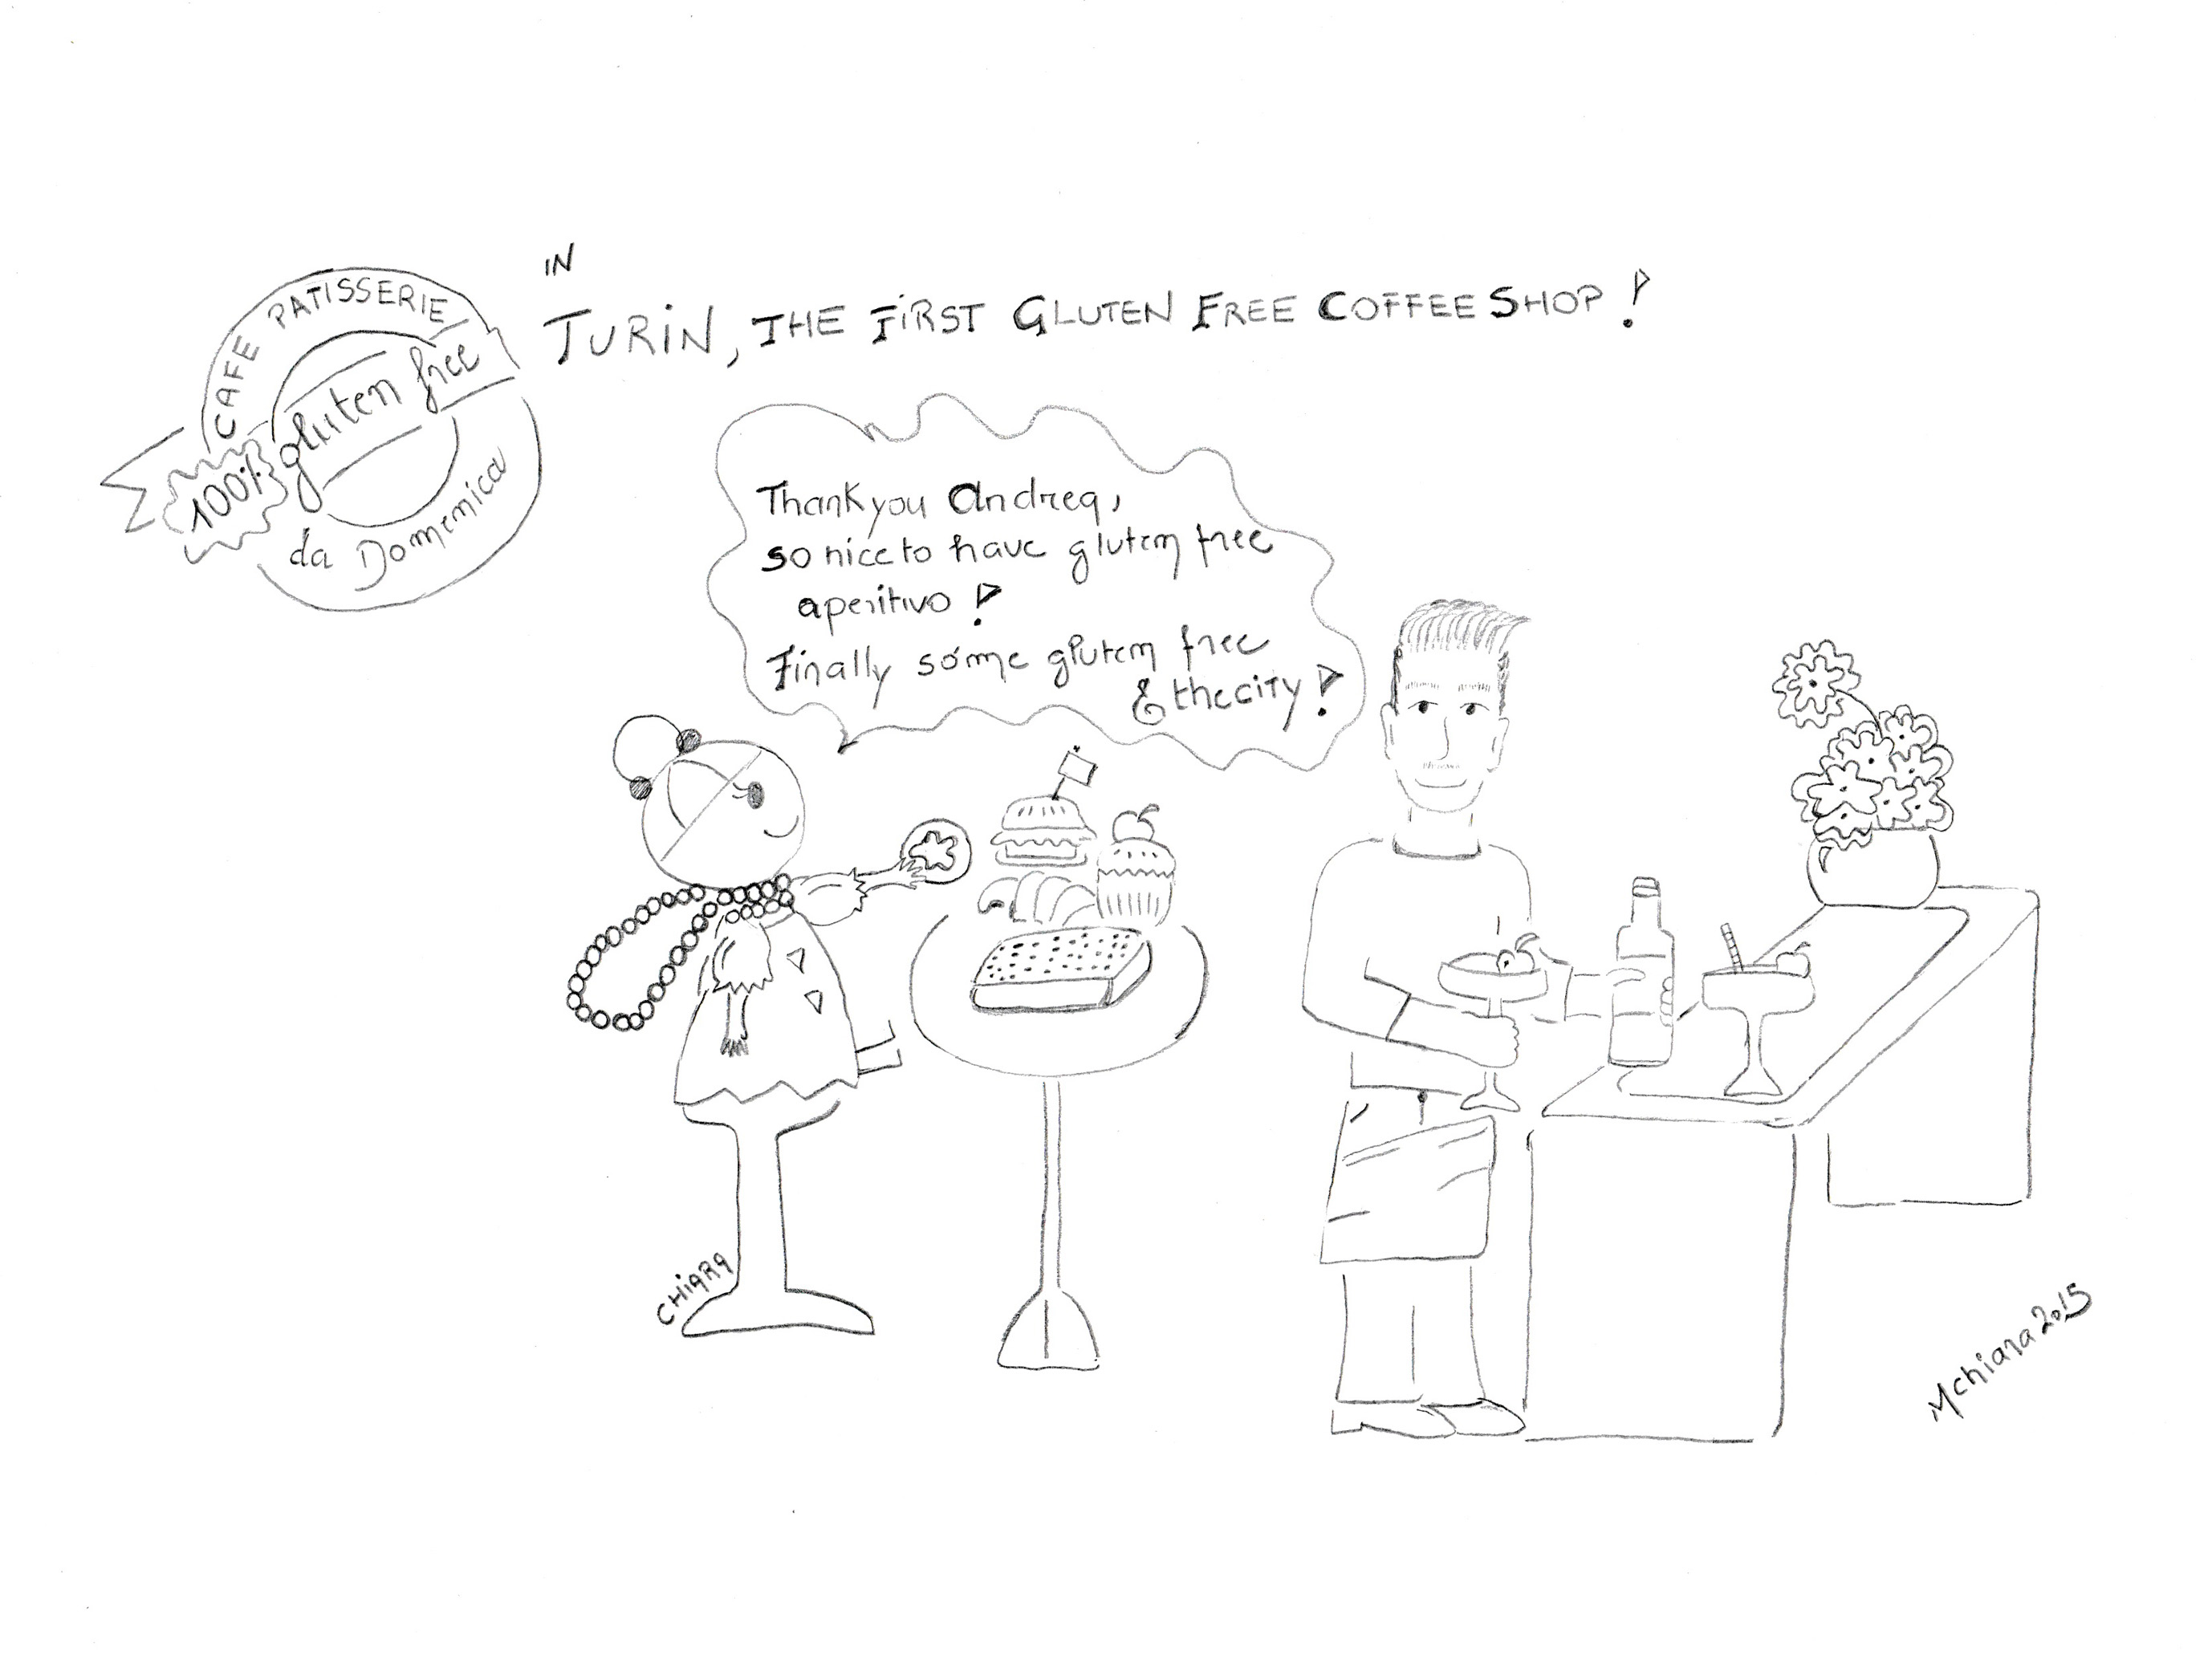 Cafe dessein Chiara 20015